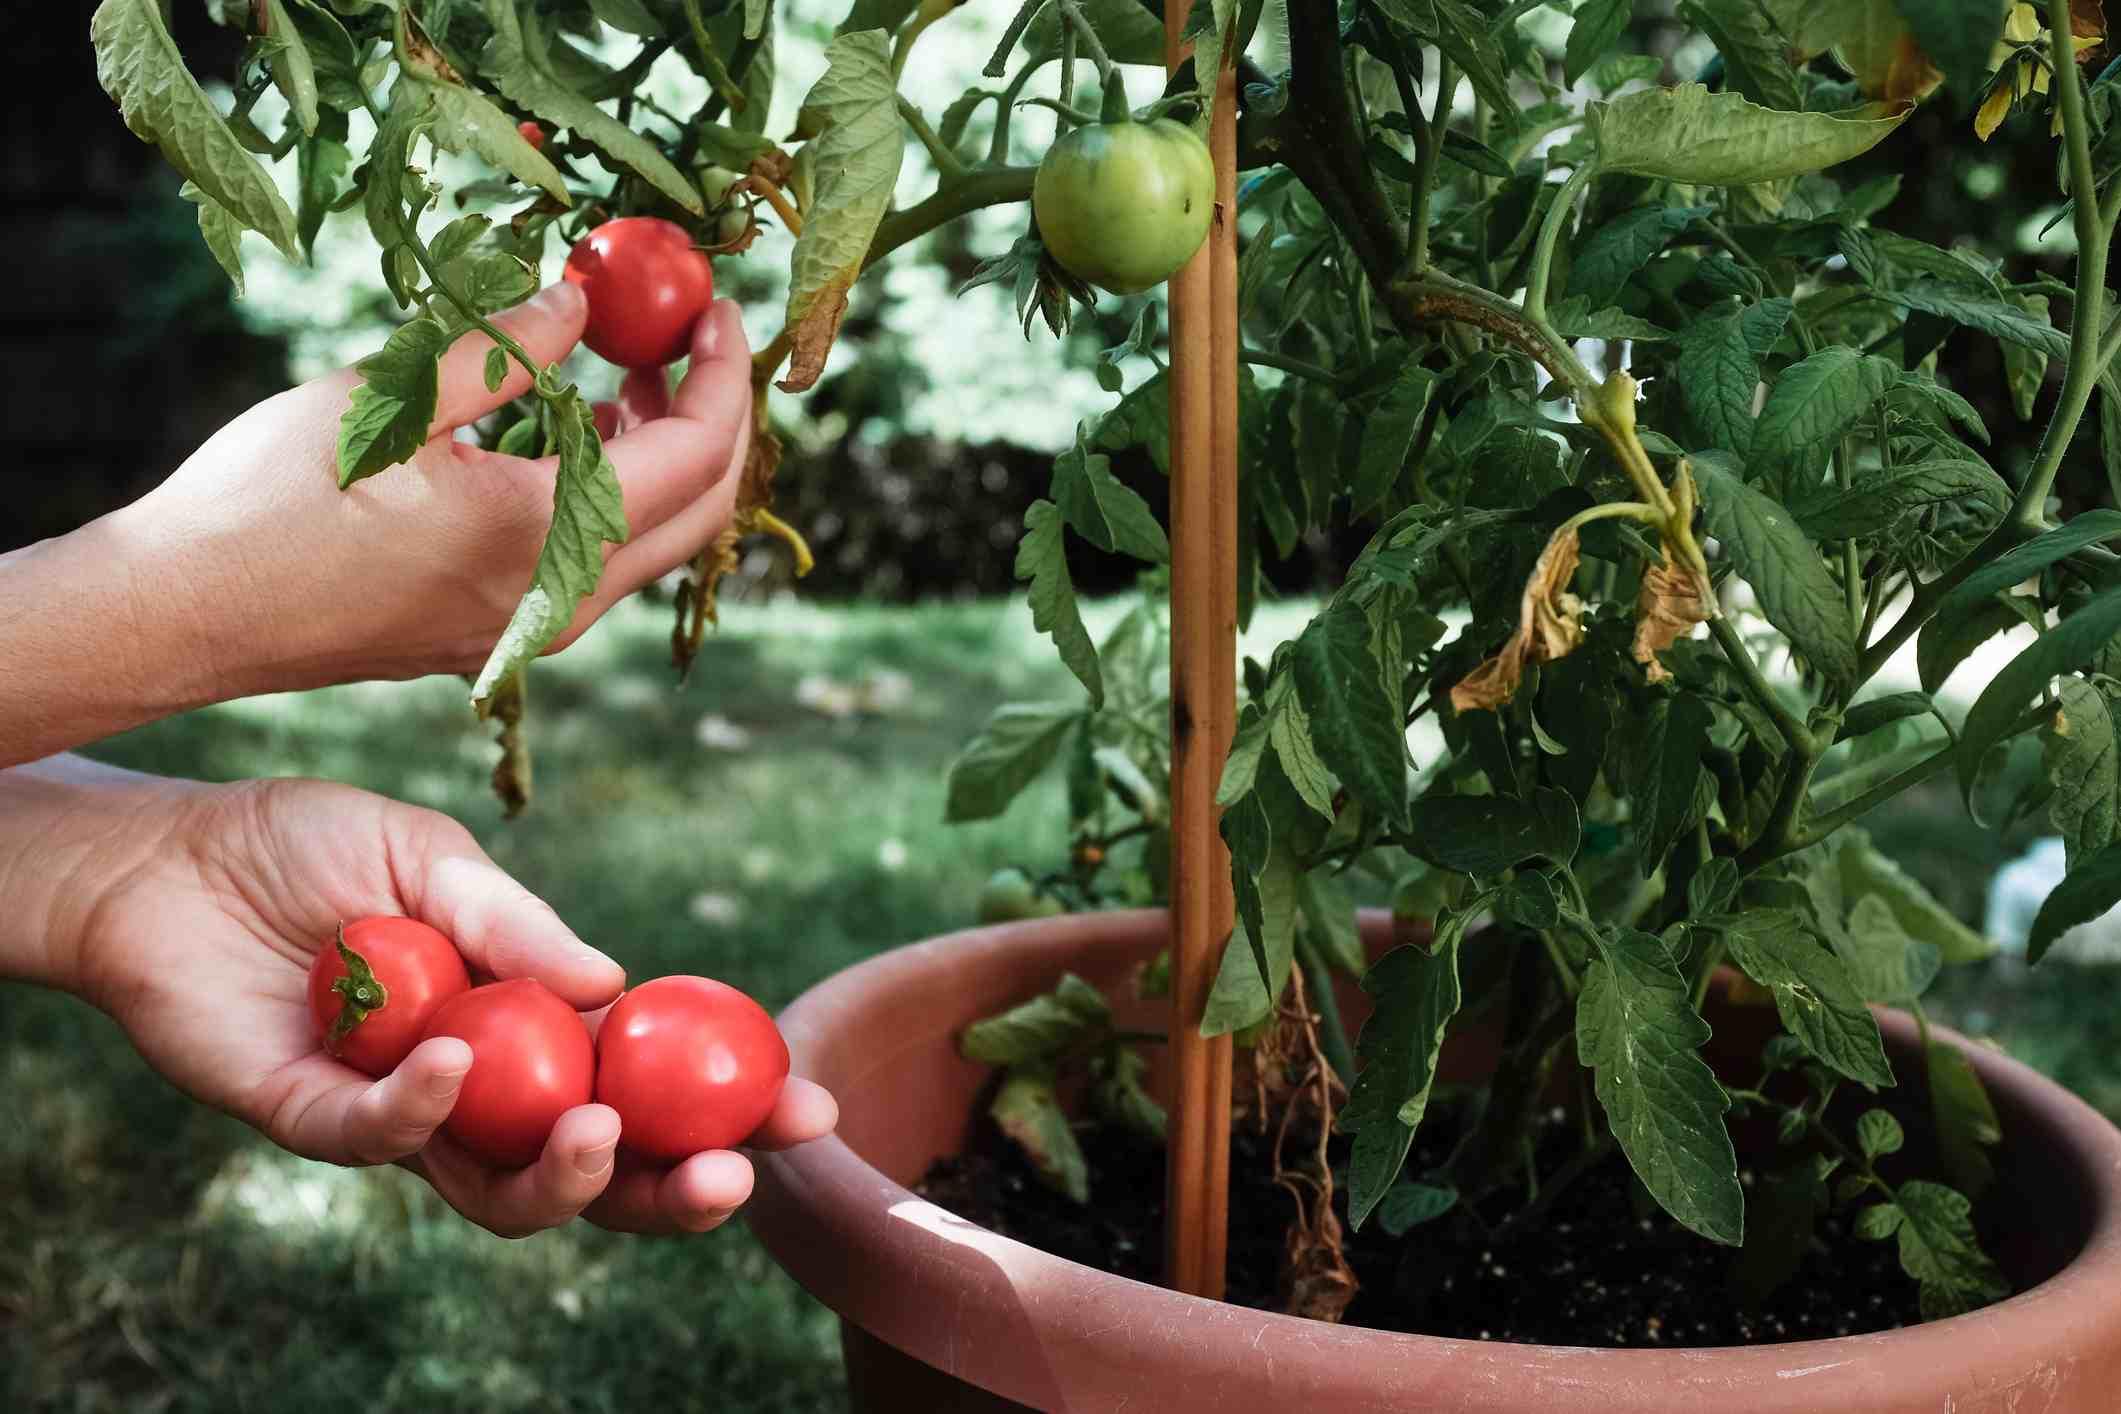 Tomato plant in container garden